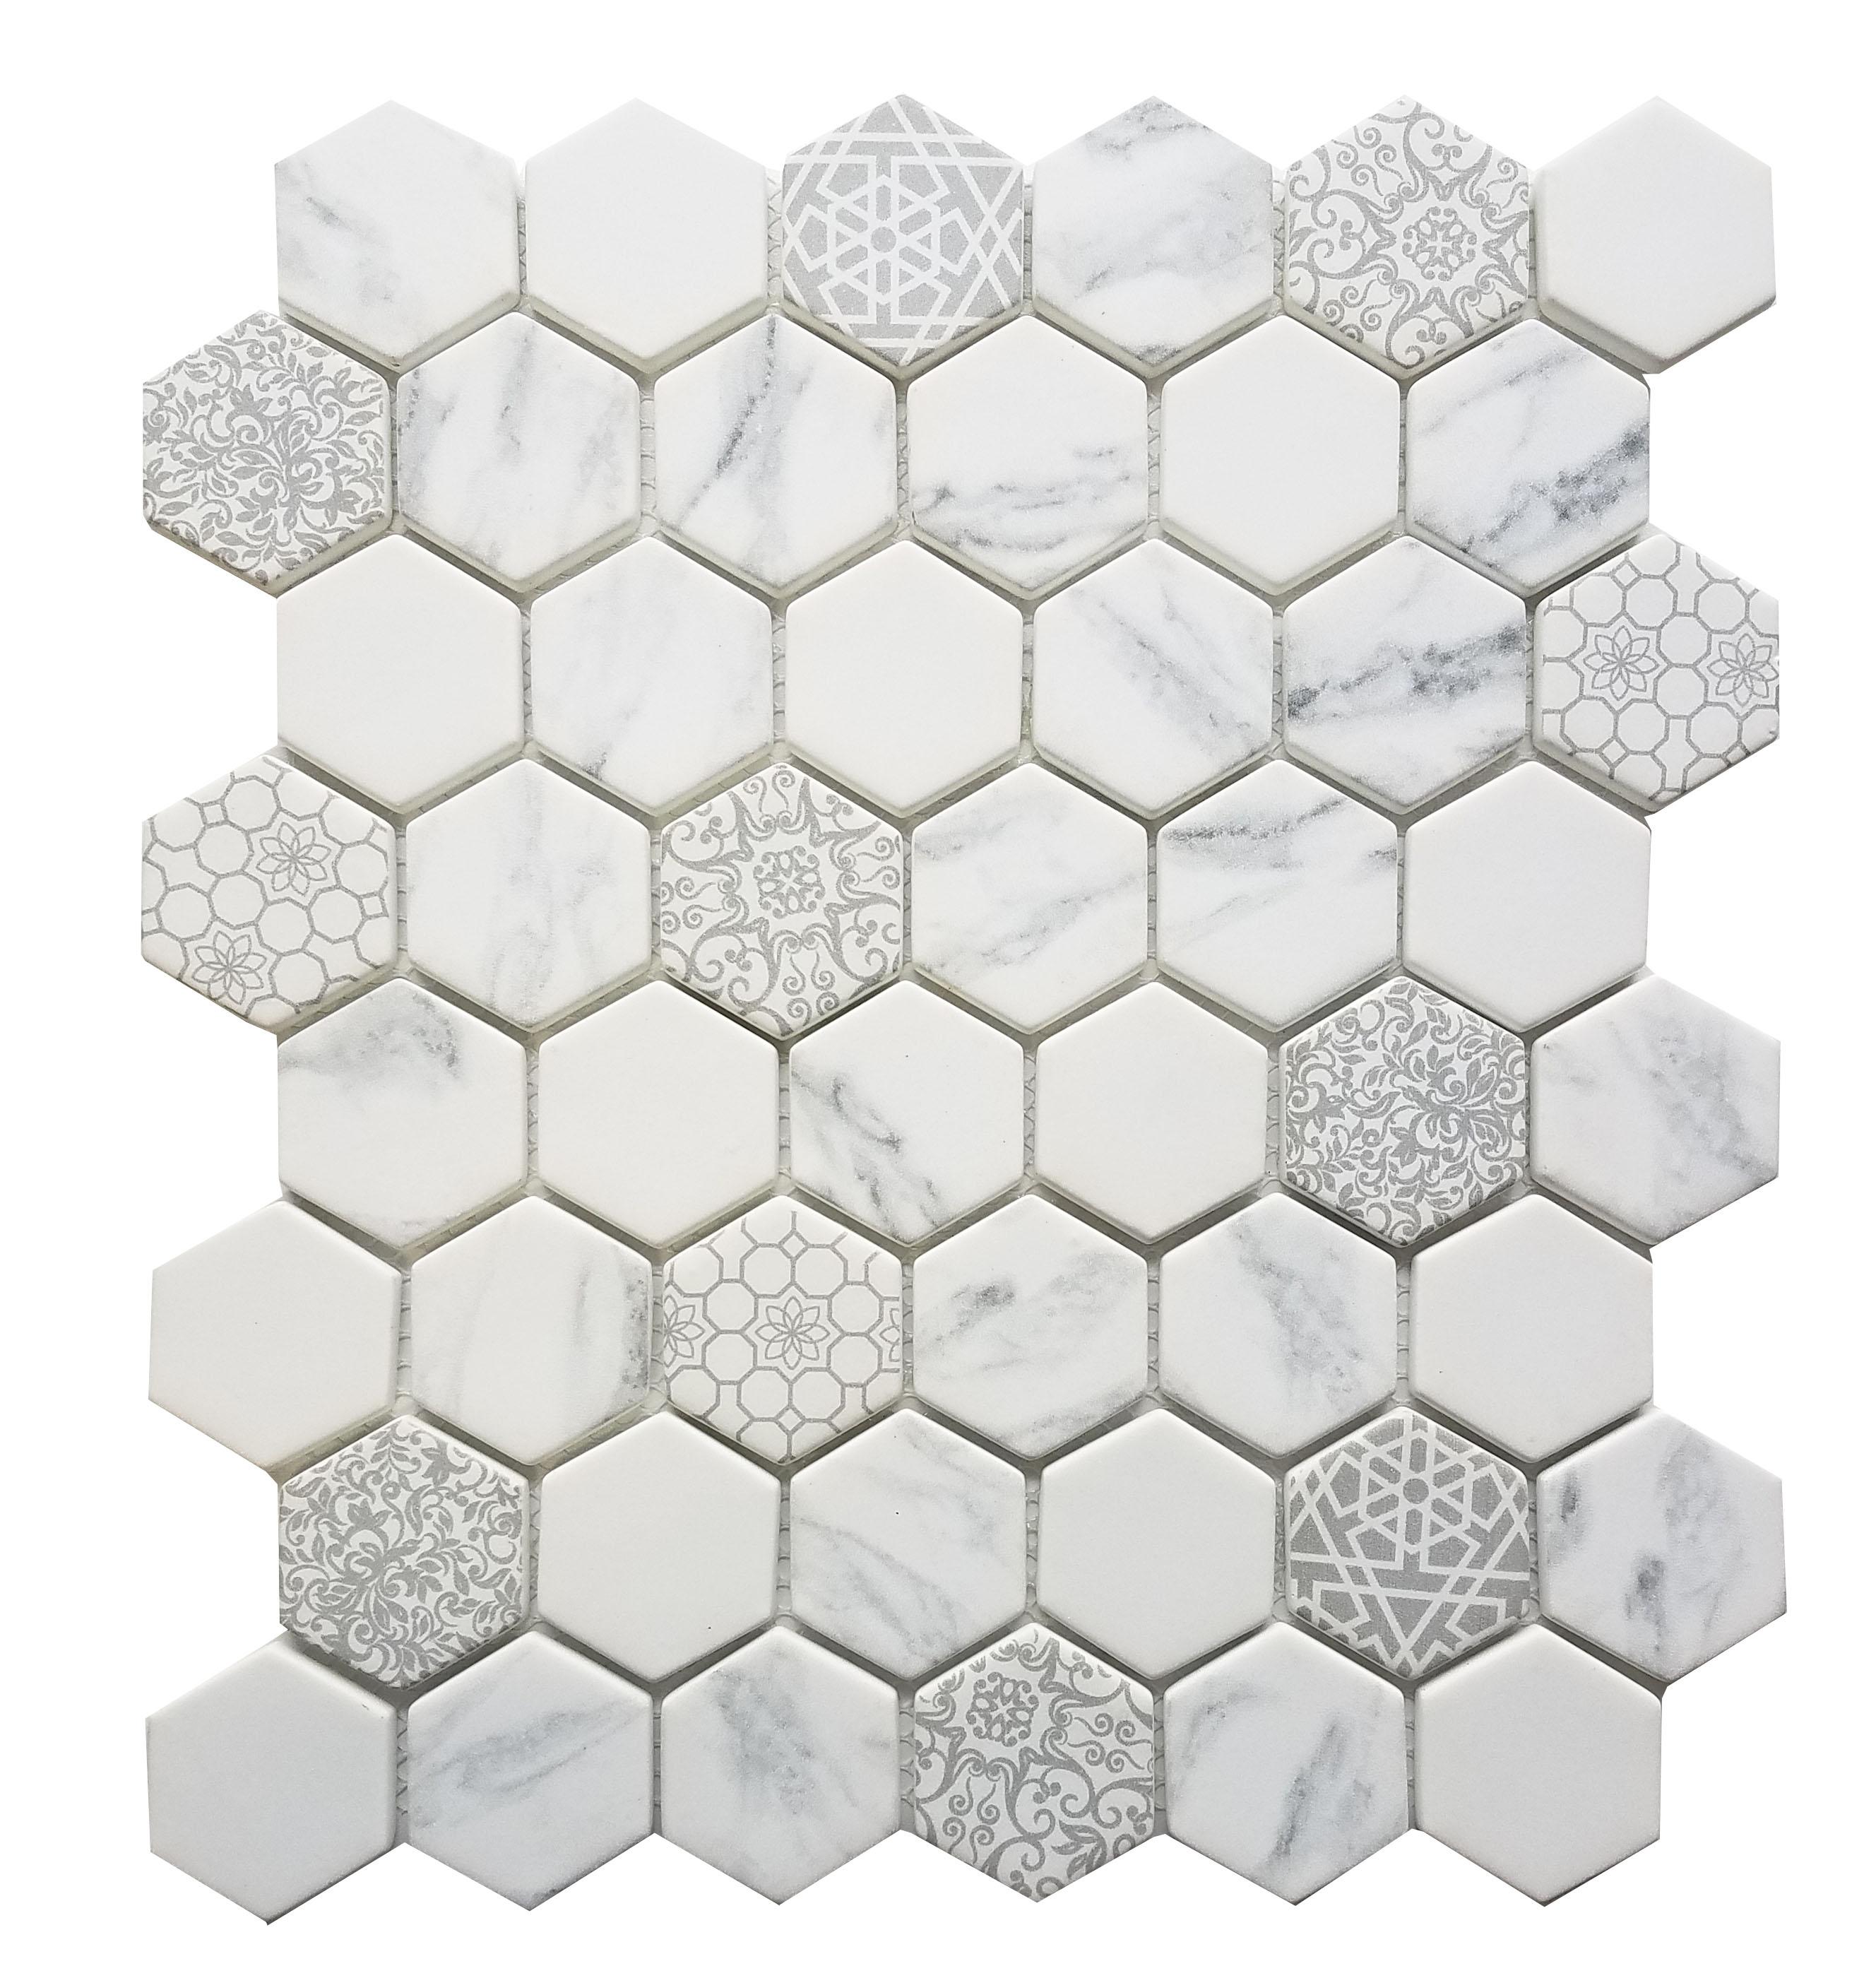 MA100-HX  2 x 2 Hexagon High density recycle glass